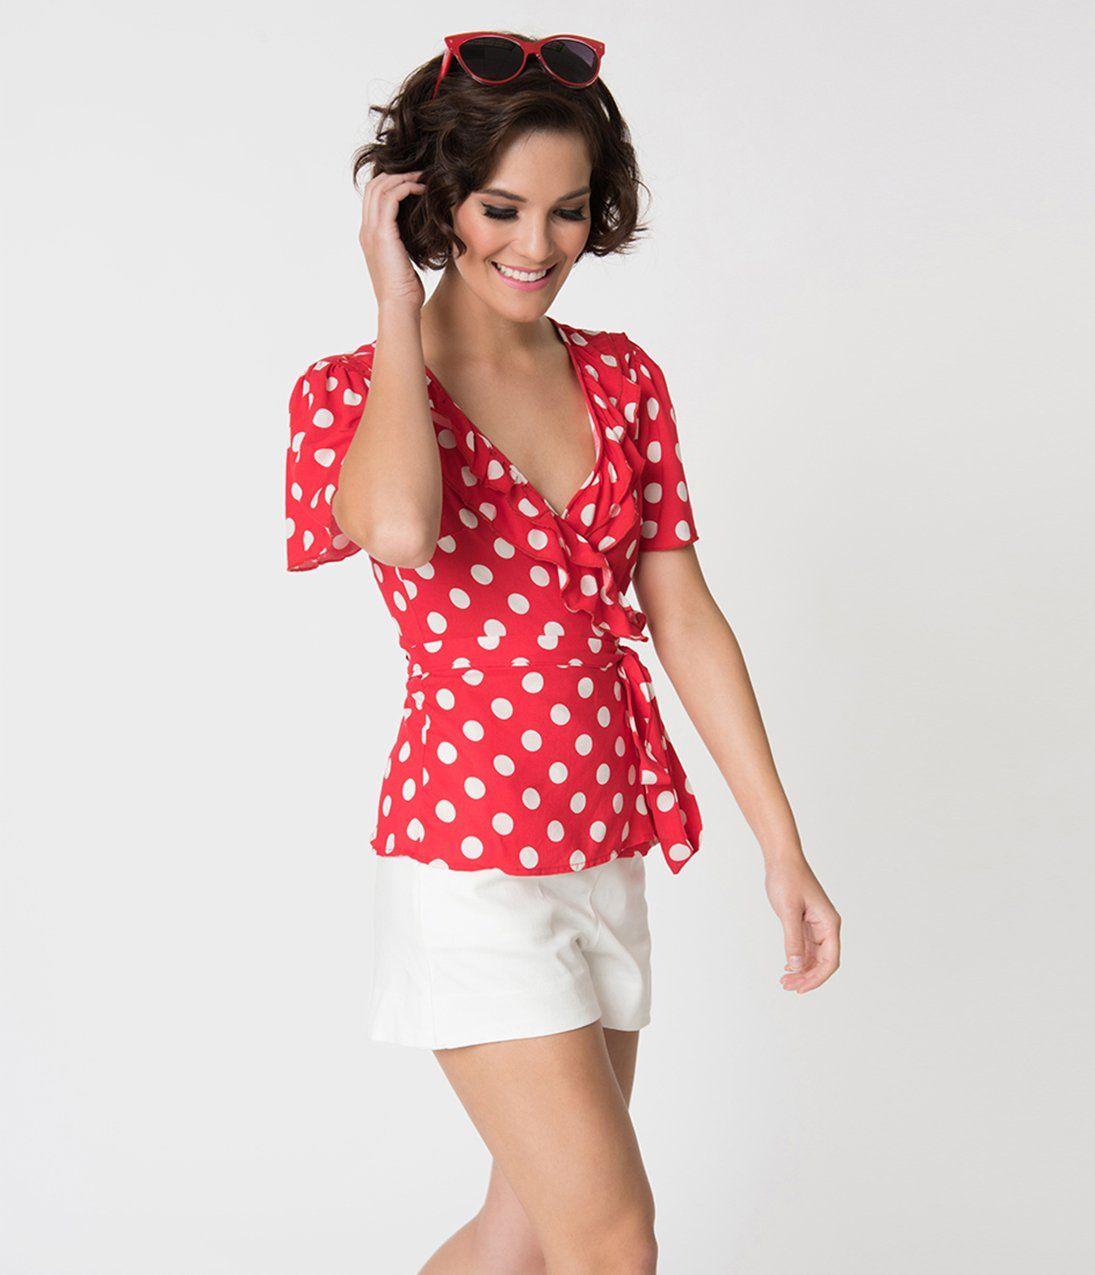 c0248e40bd4f Retro Style Red & White Polka Dot Ruffled Short Sleeve Wrap Blouse – Unique  Vintage